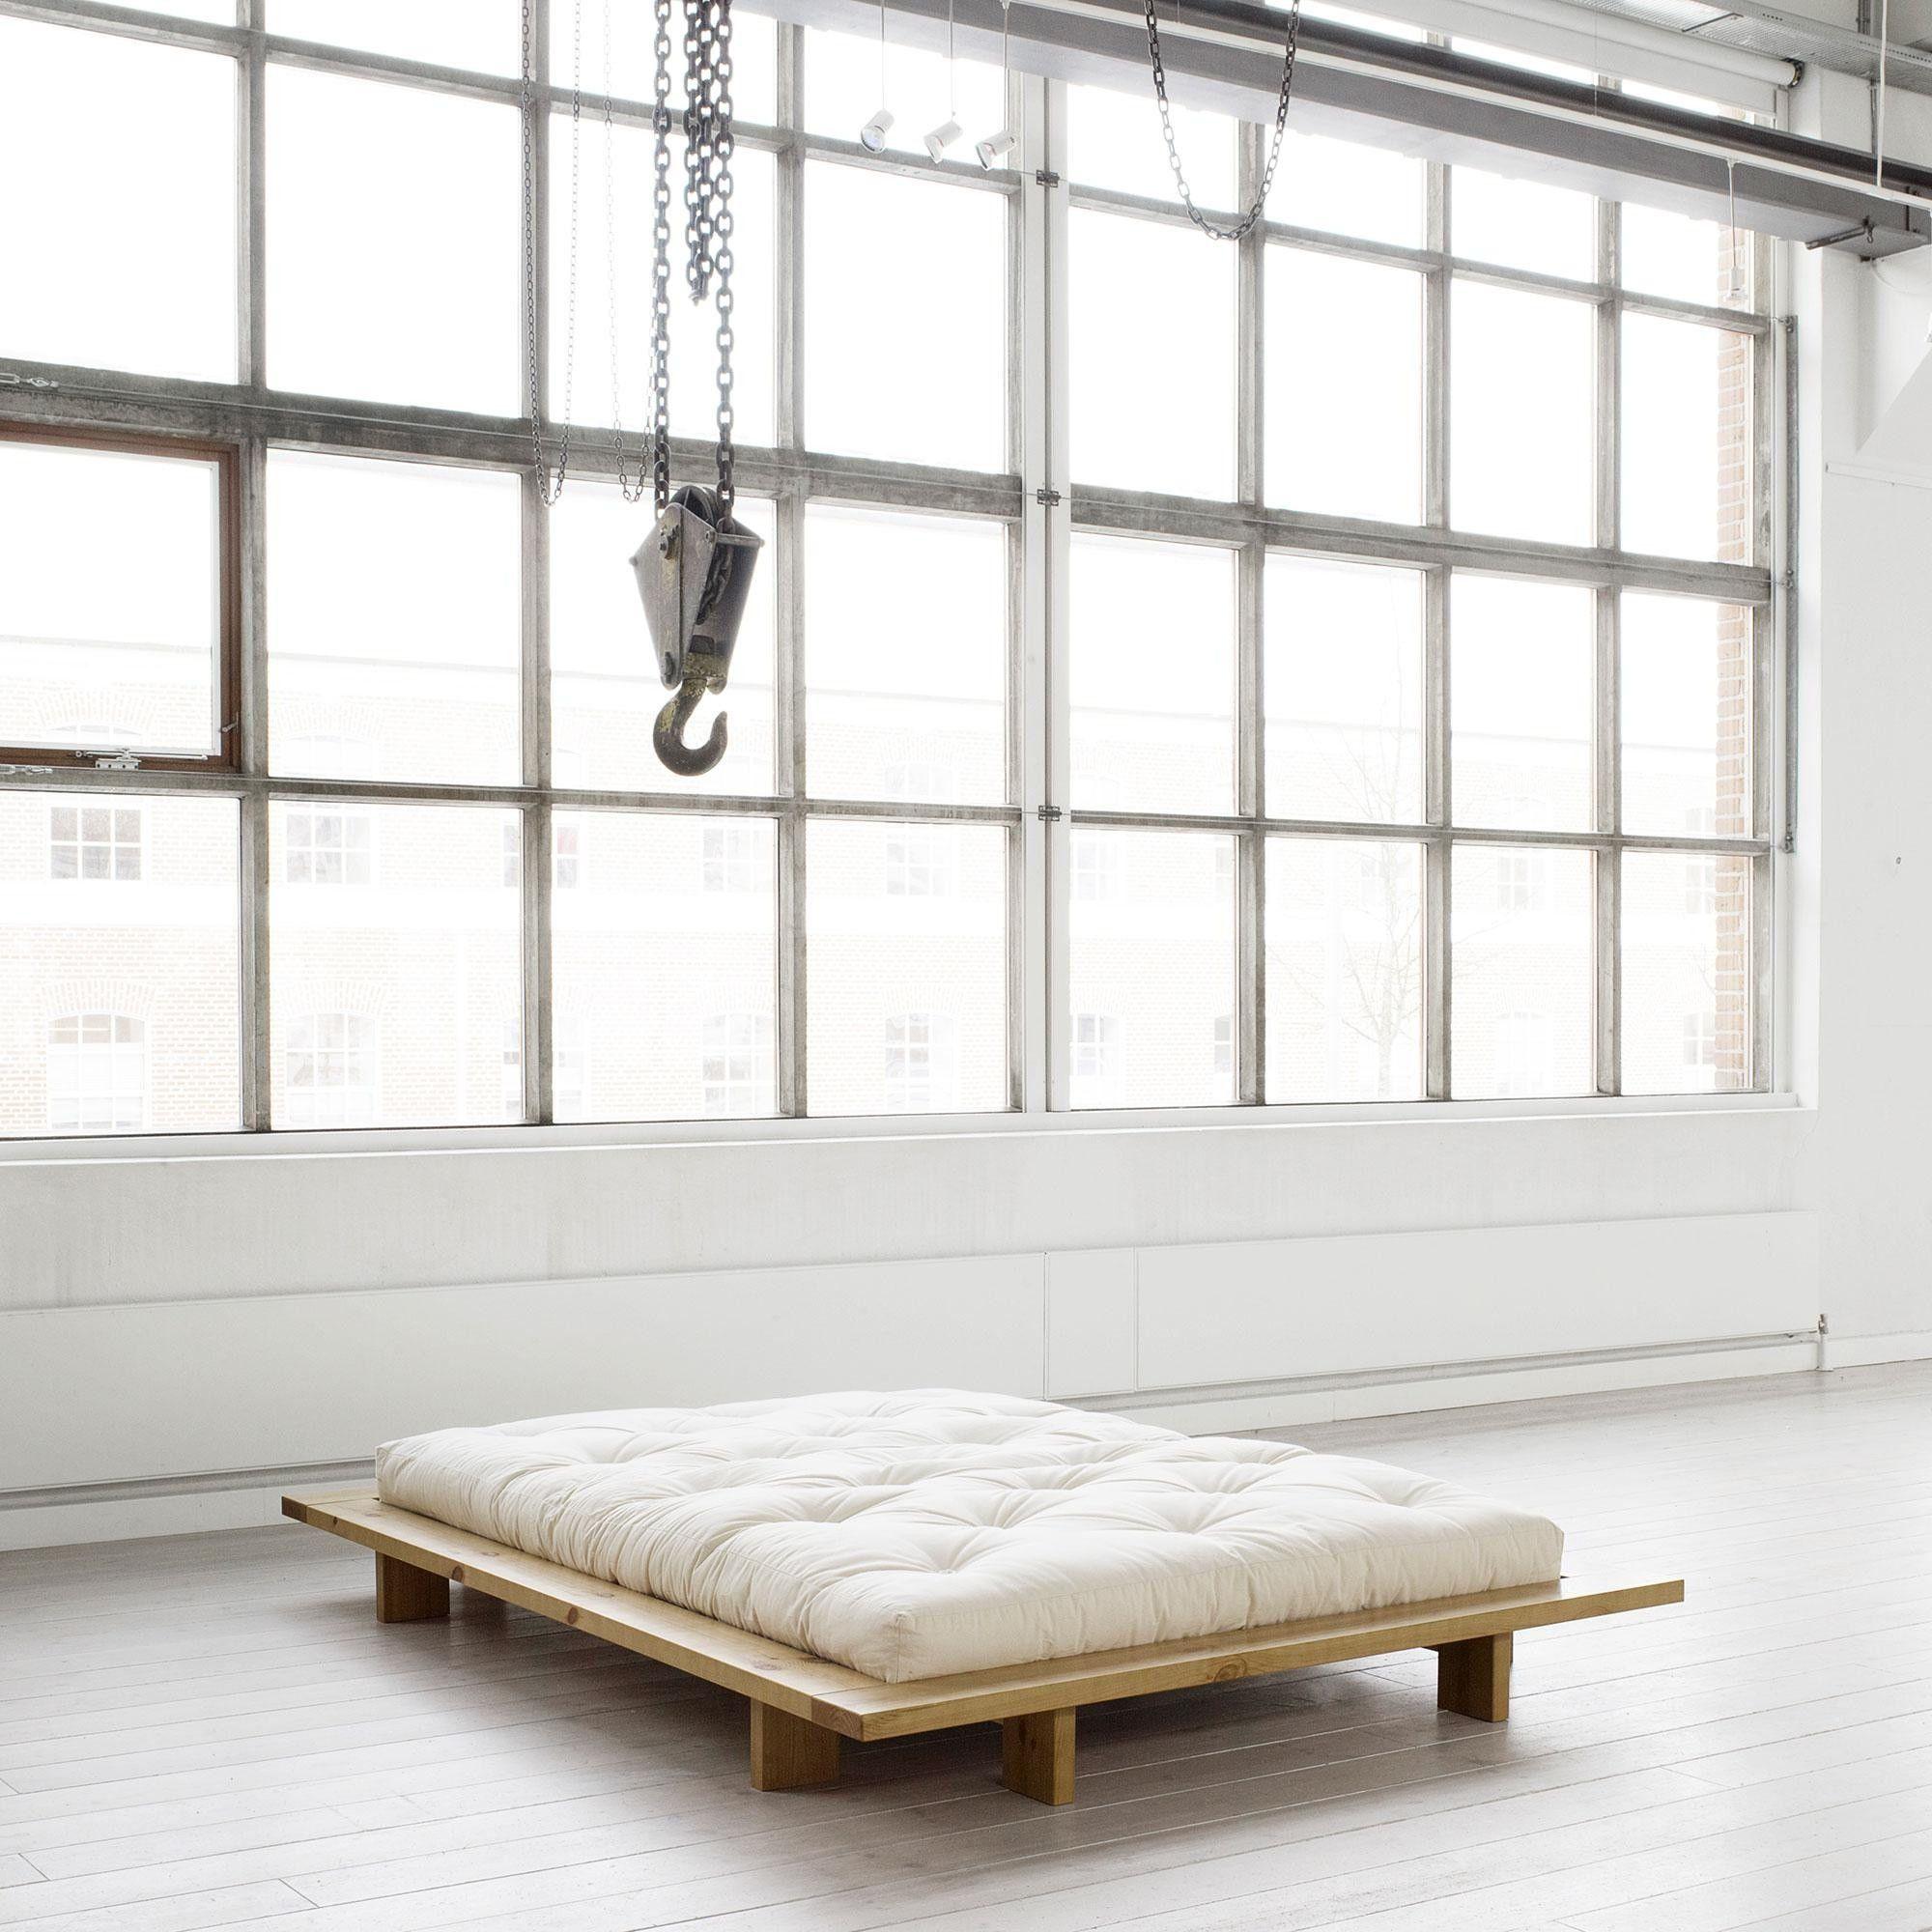 Karup Japan Futon Bed Ambientedirect Minimalist Bed